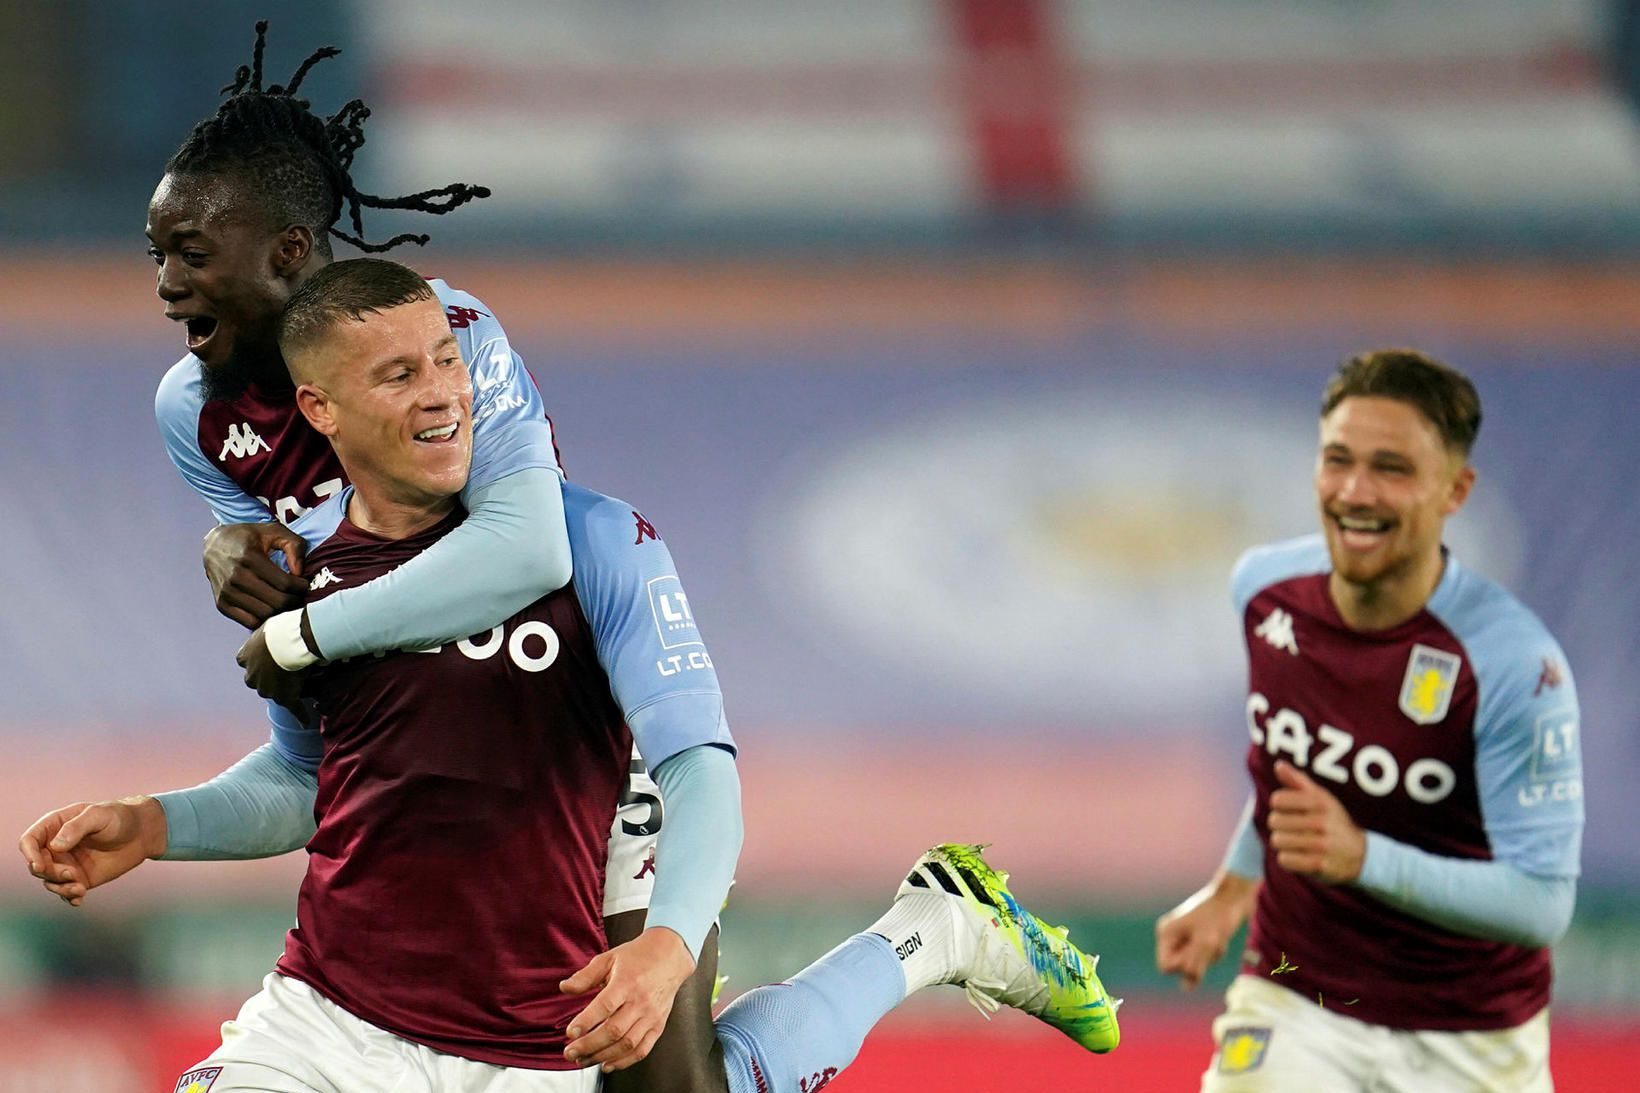 Leikmenn Aston Villa fagna sigurmarkinu.